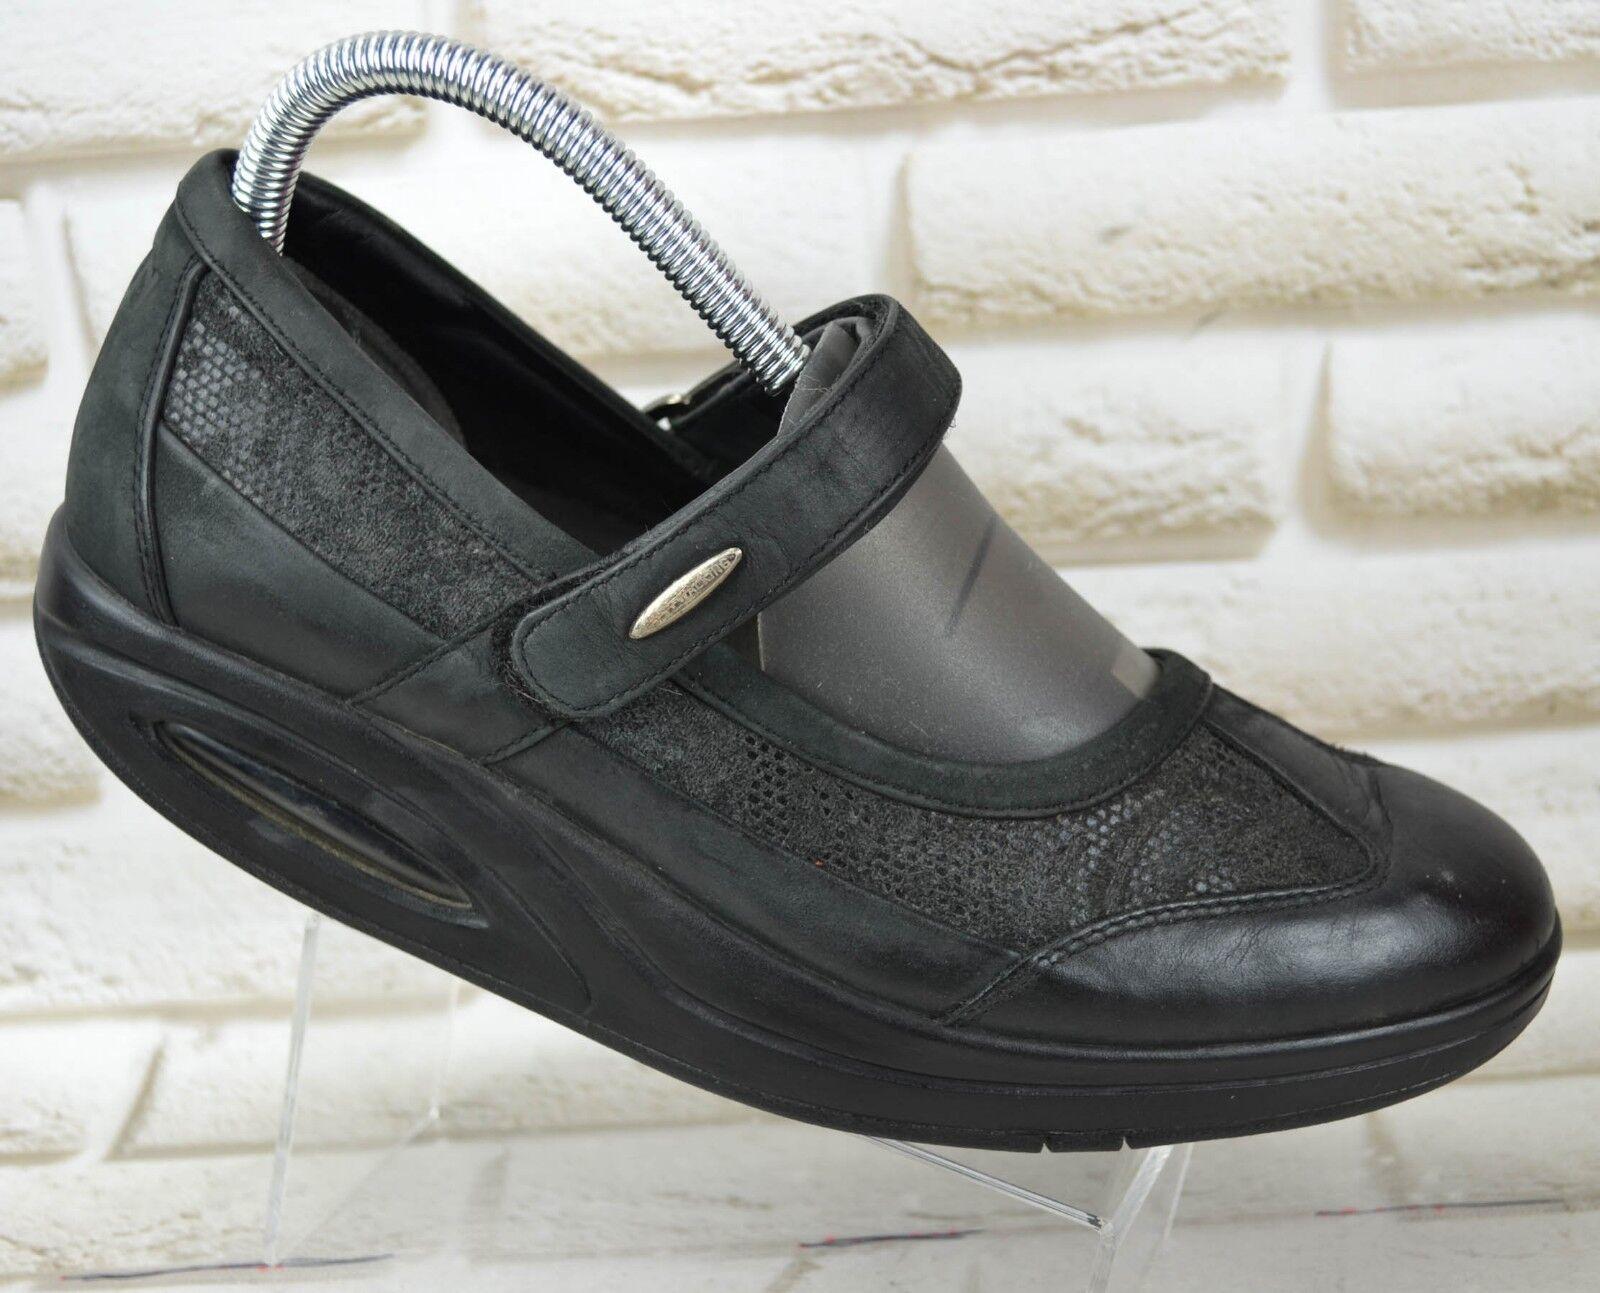 RYN Toning Womens Leather Healthy Walking Toning RYN Shoes Ballerinas Size 7 UK 40 EU a731ee